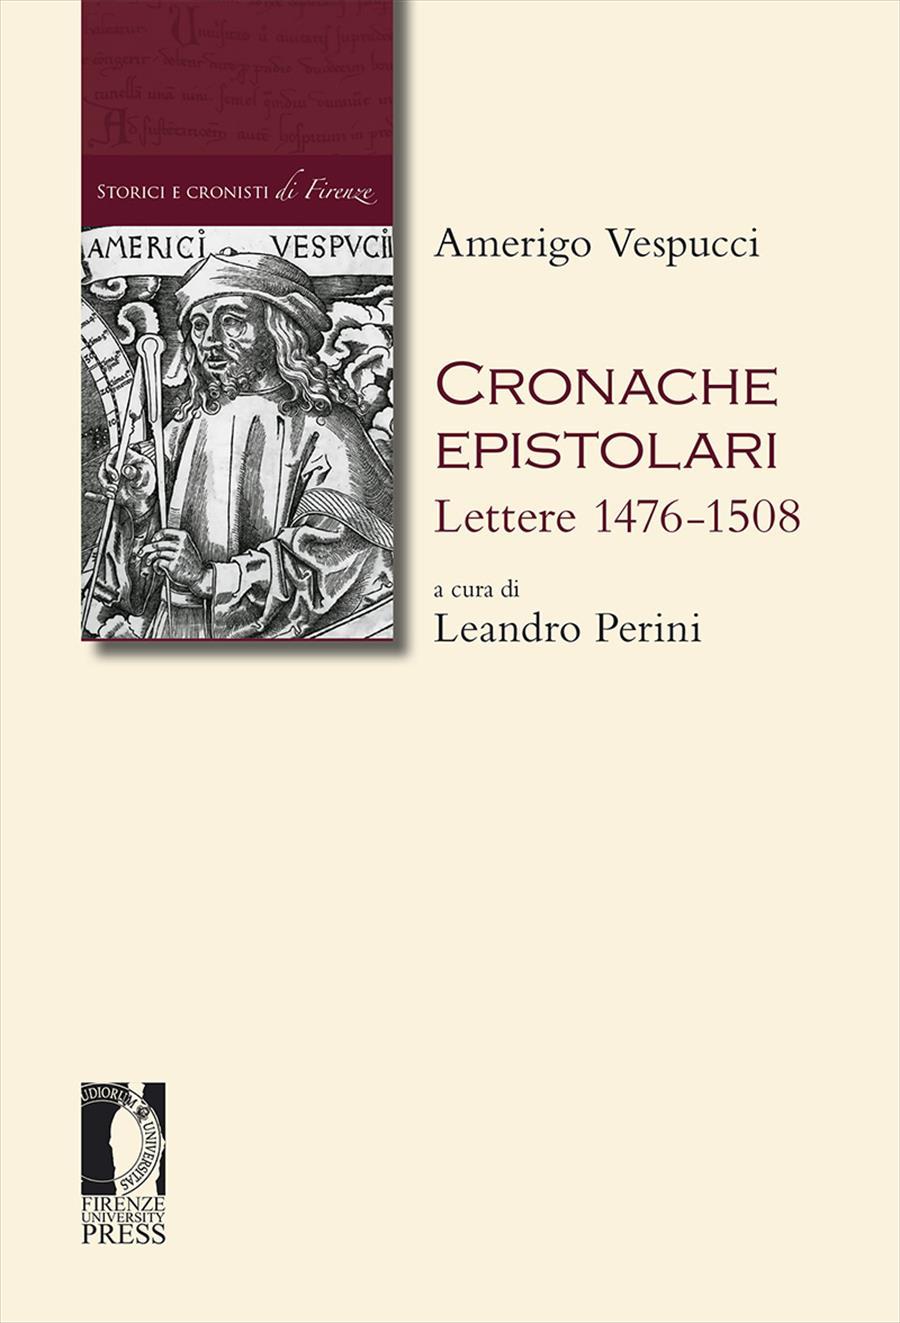 Cronache epistolari. Lettere 1476-1508